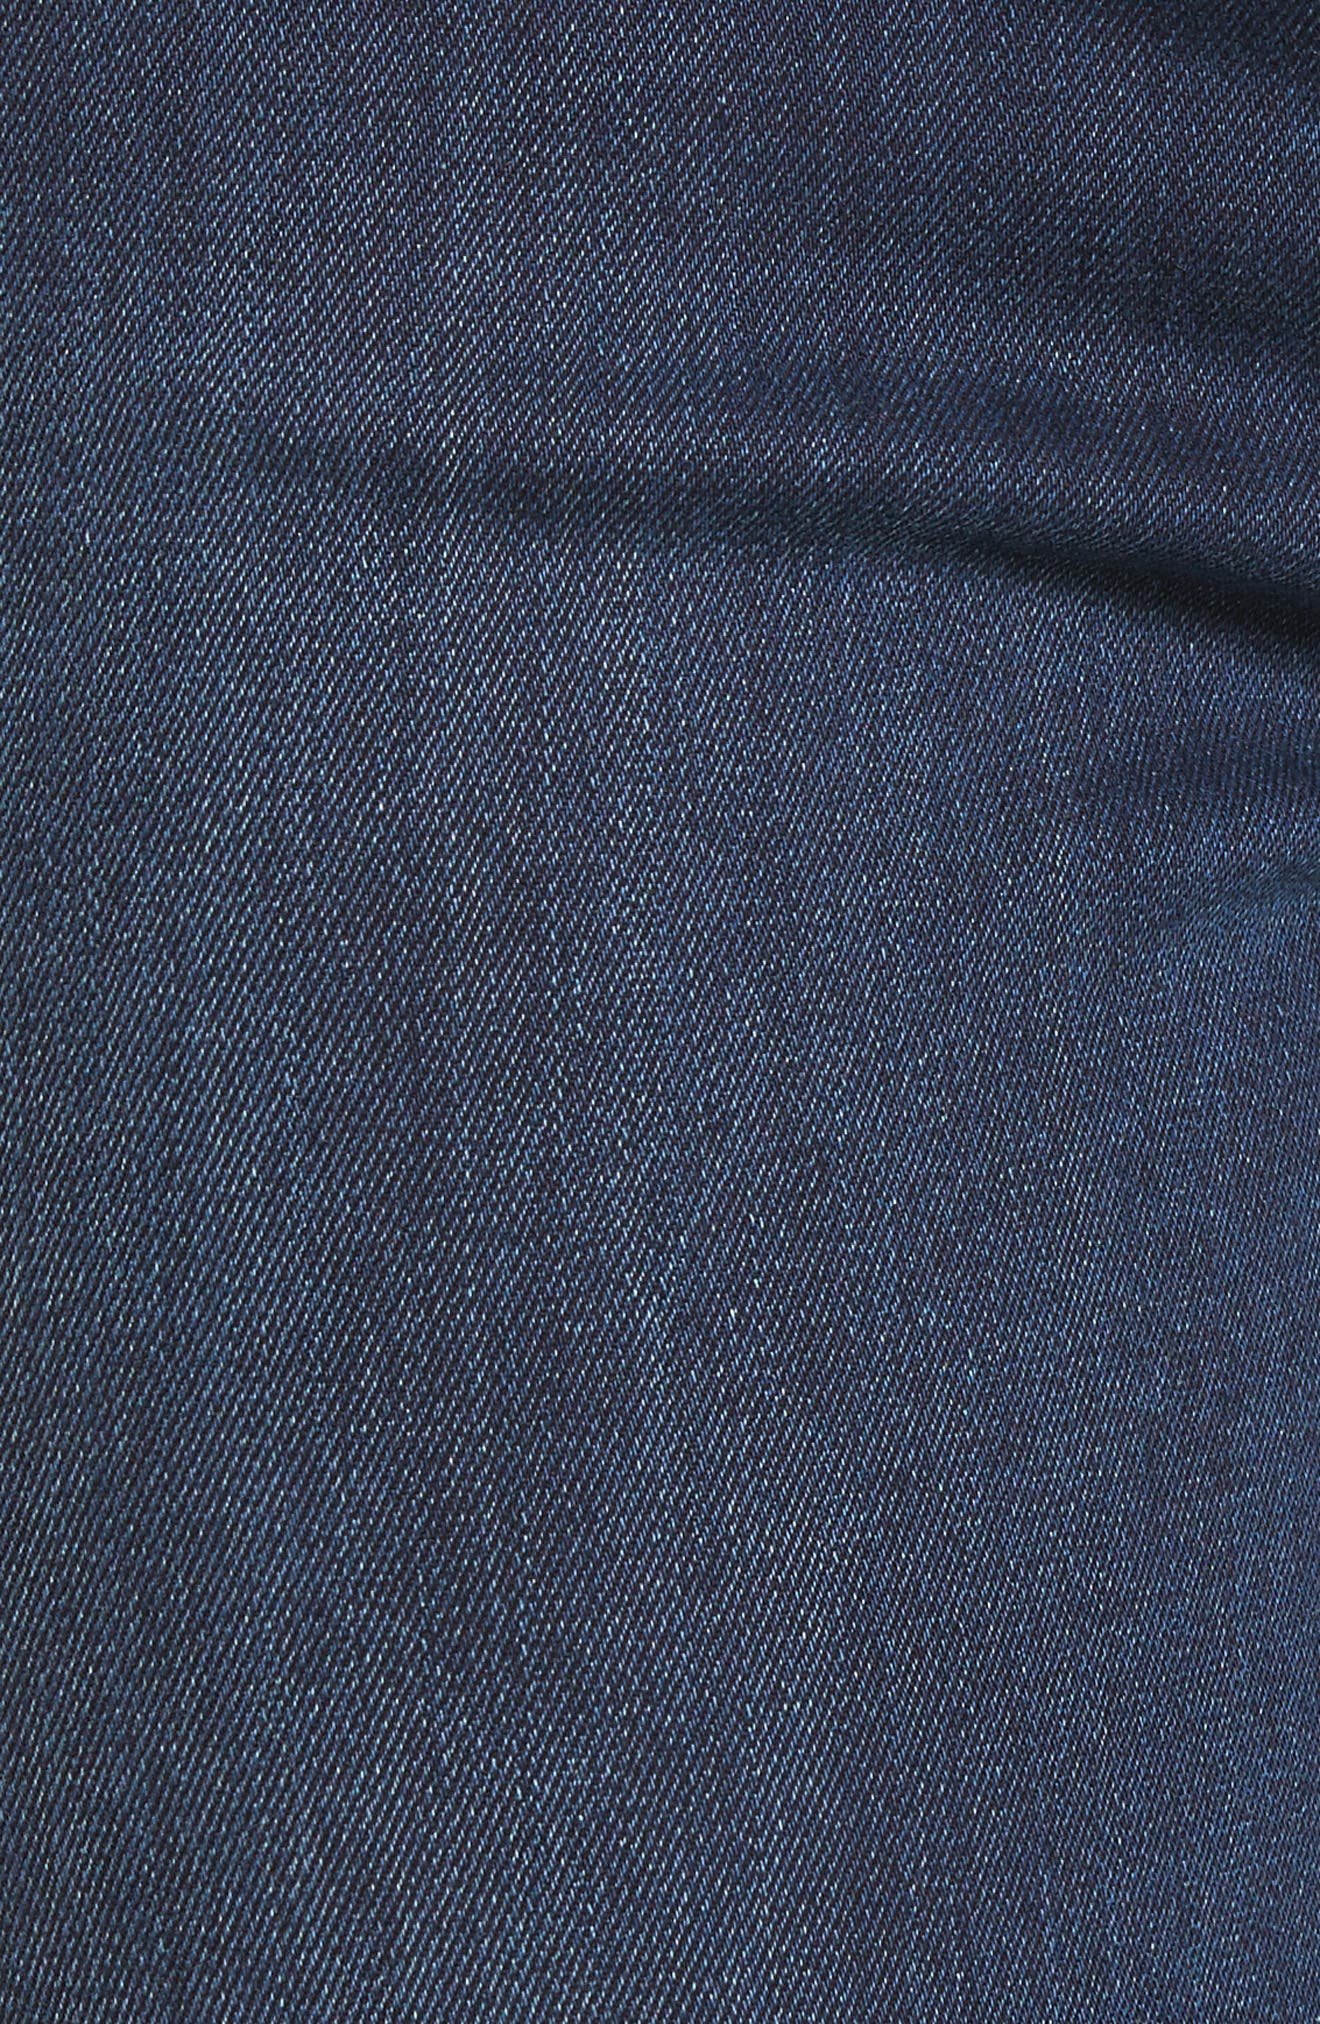 Halle Super Skinny Jeans,                             Alternate thumbnail 6, color,                             Deep Sea Blue